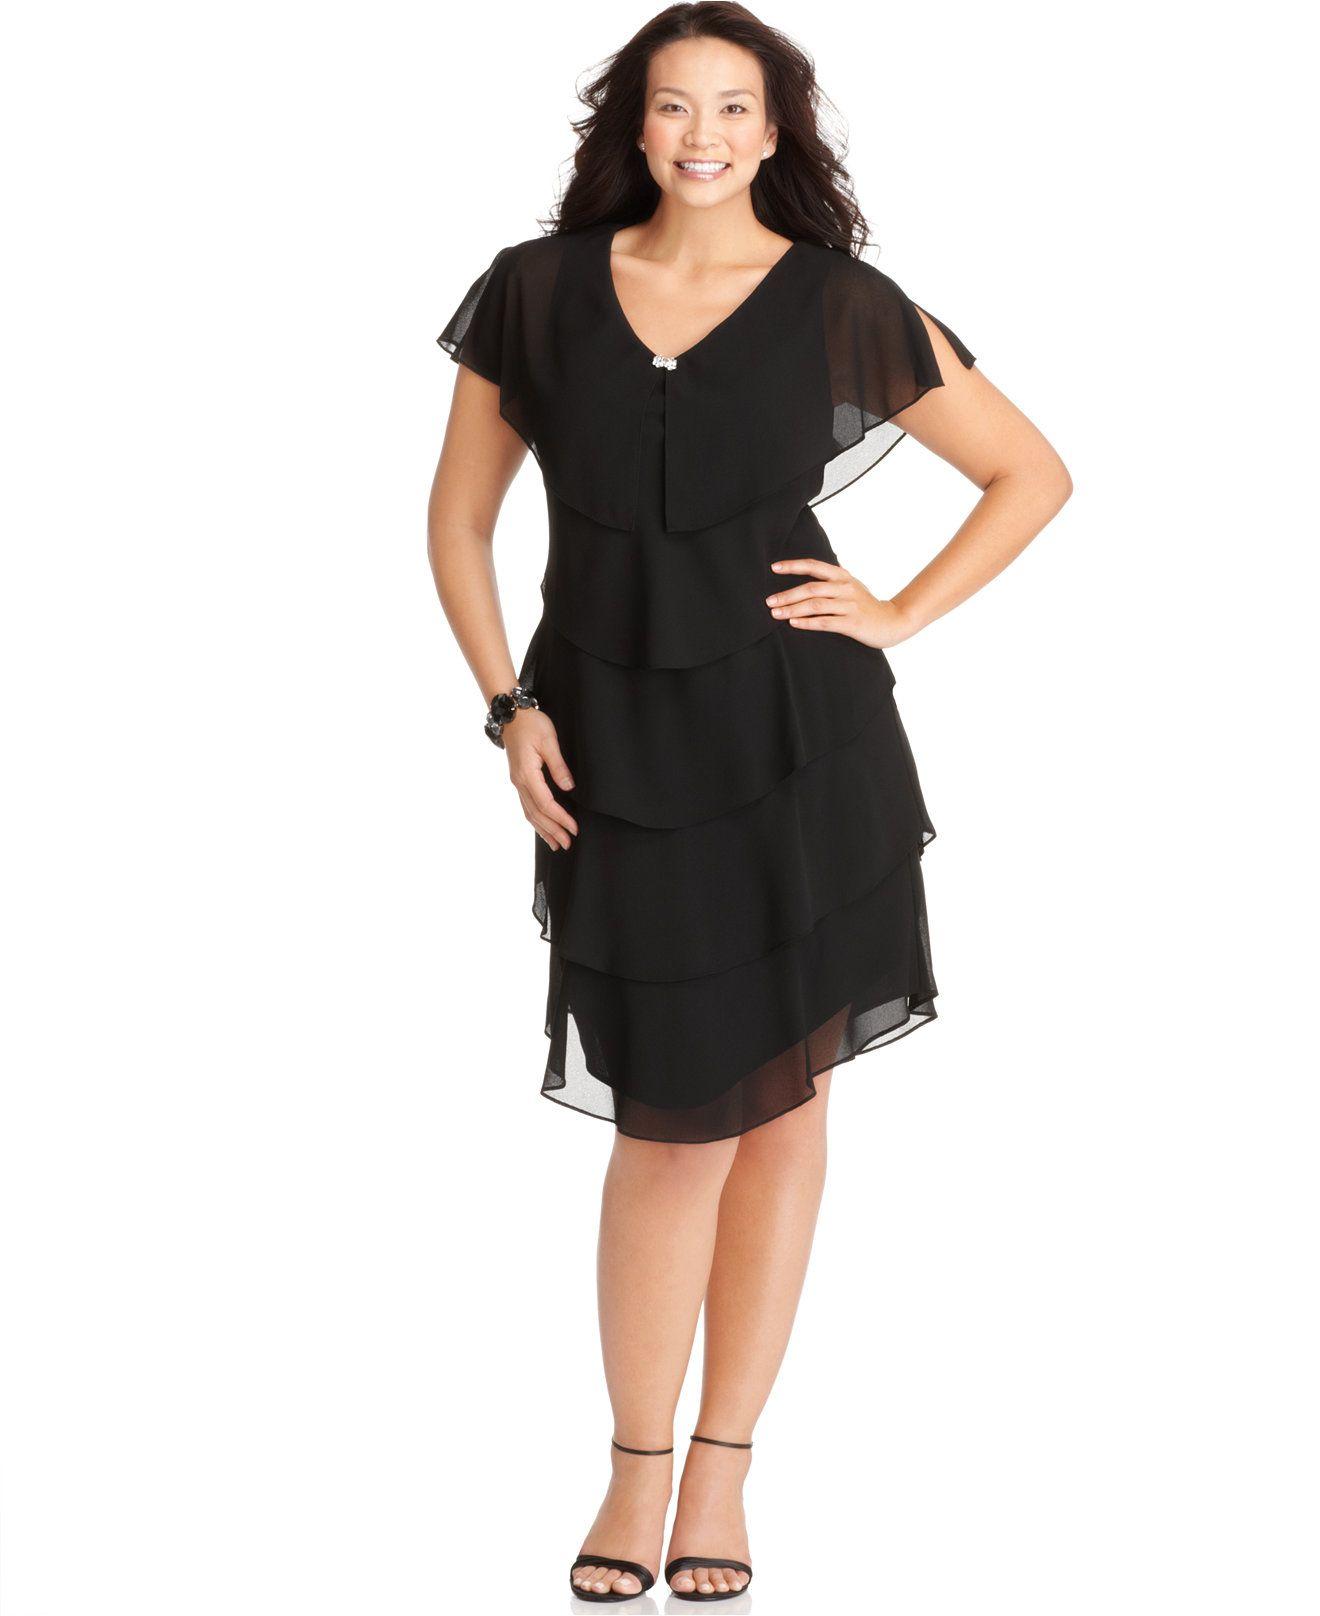 Black tiered dress plus size